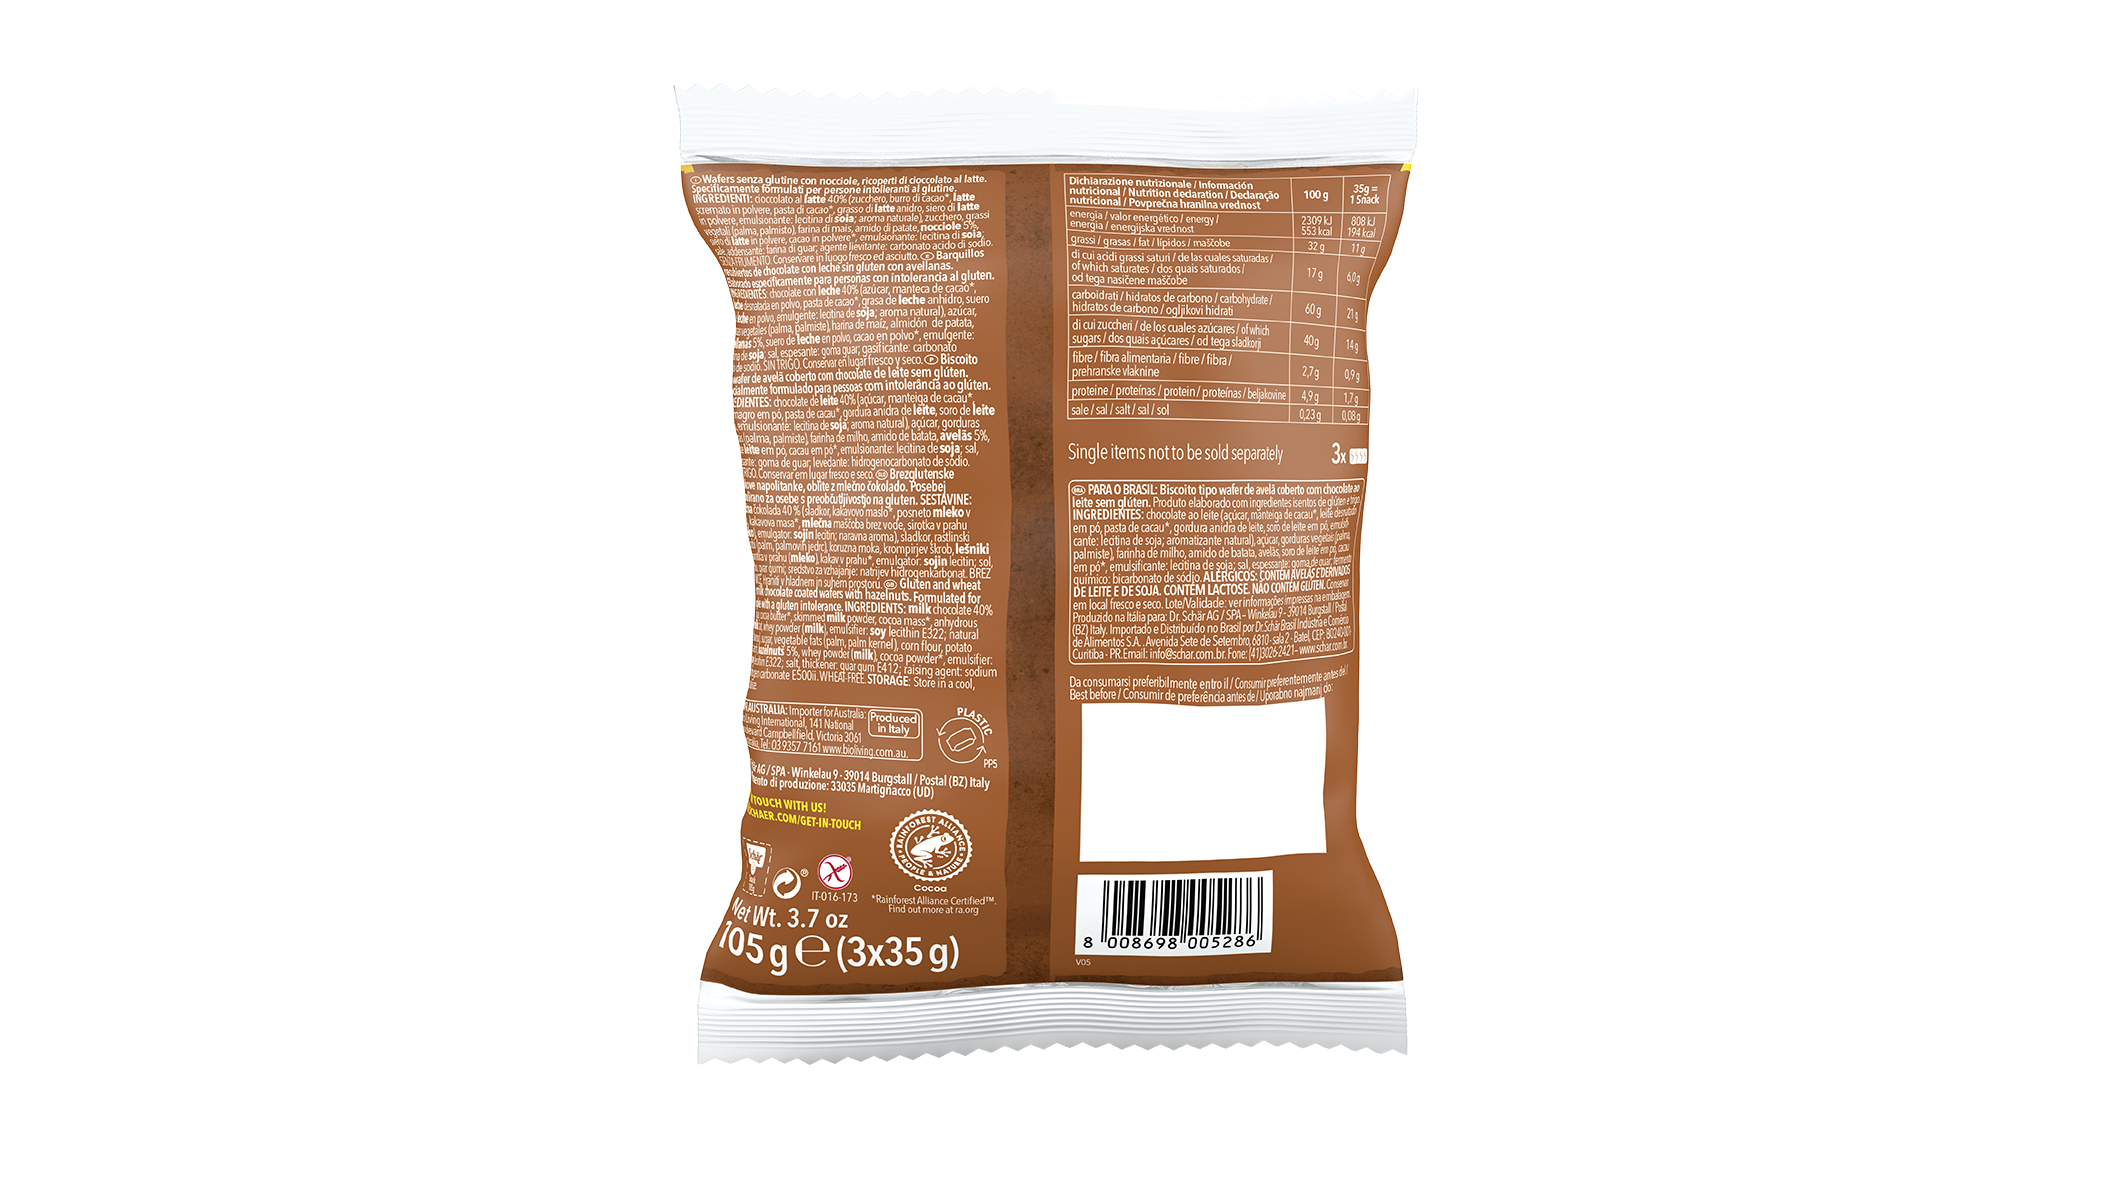 Snack - Csokoládéval bevont mogyorós ostya